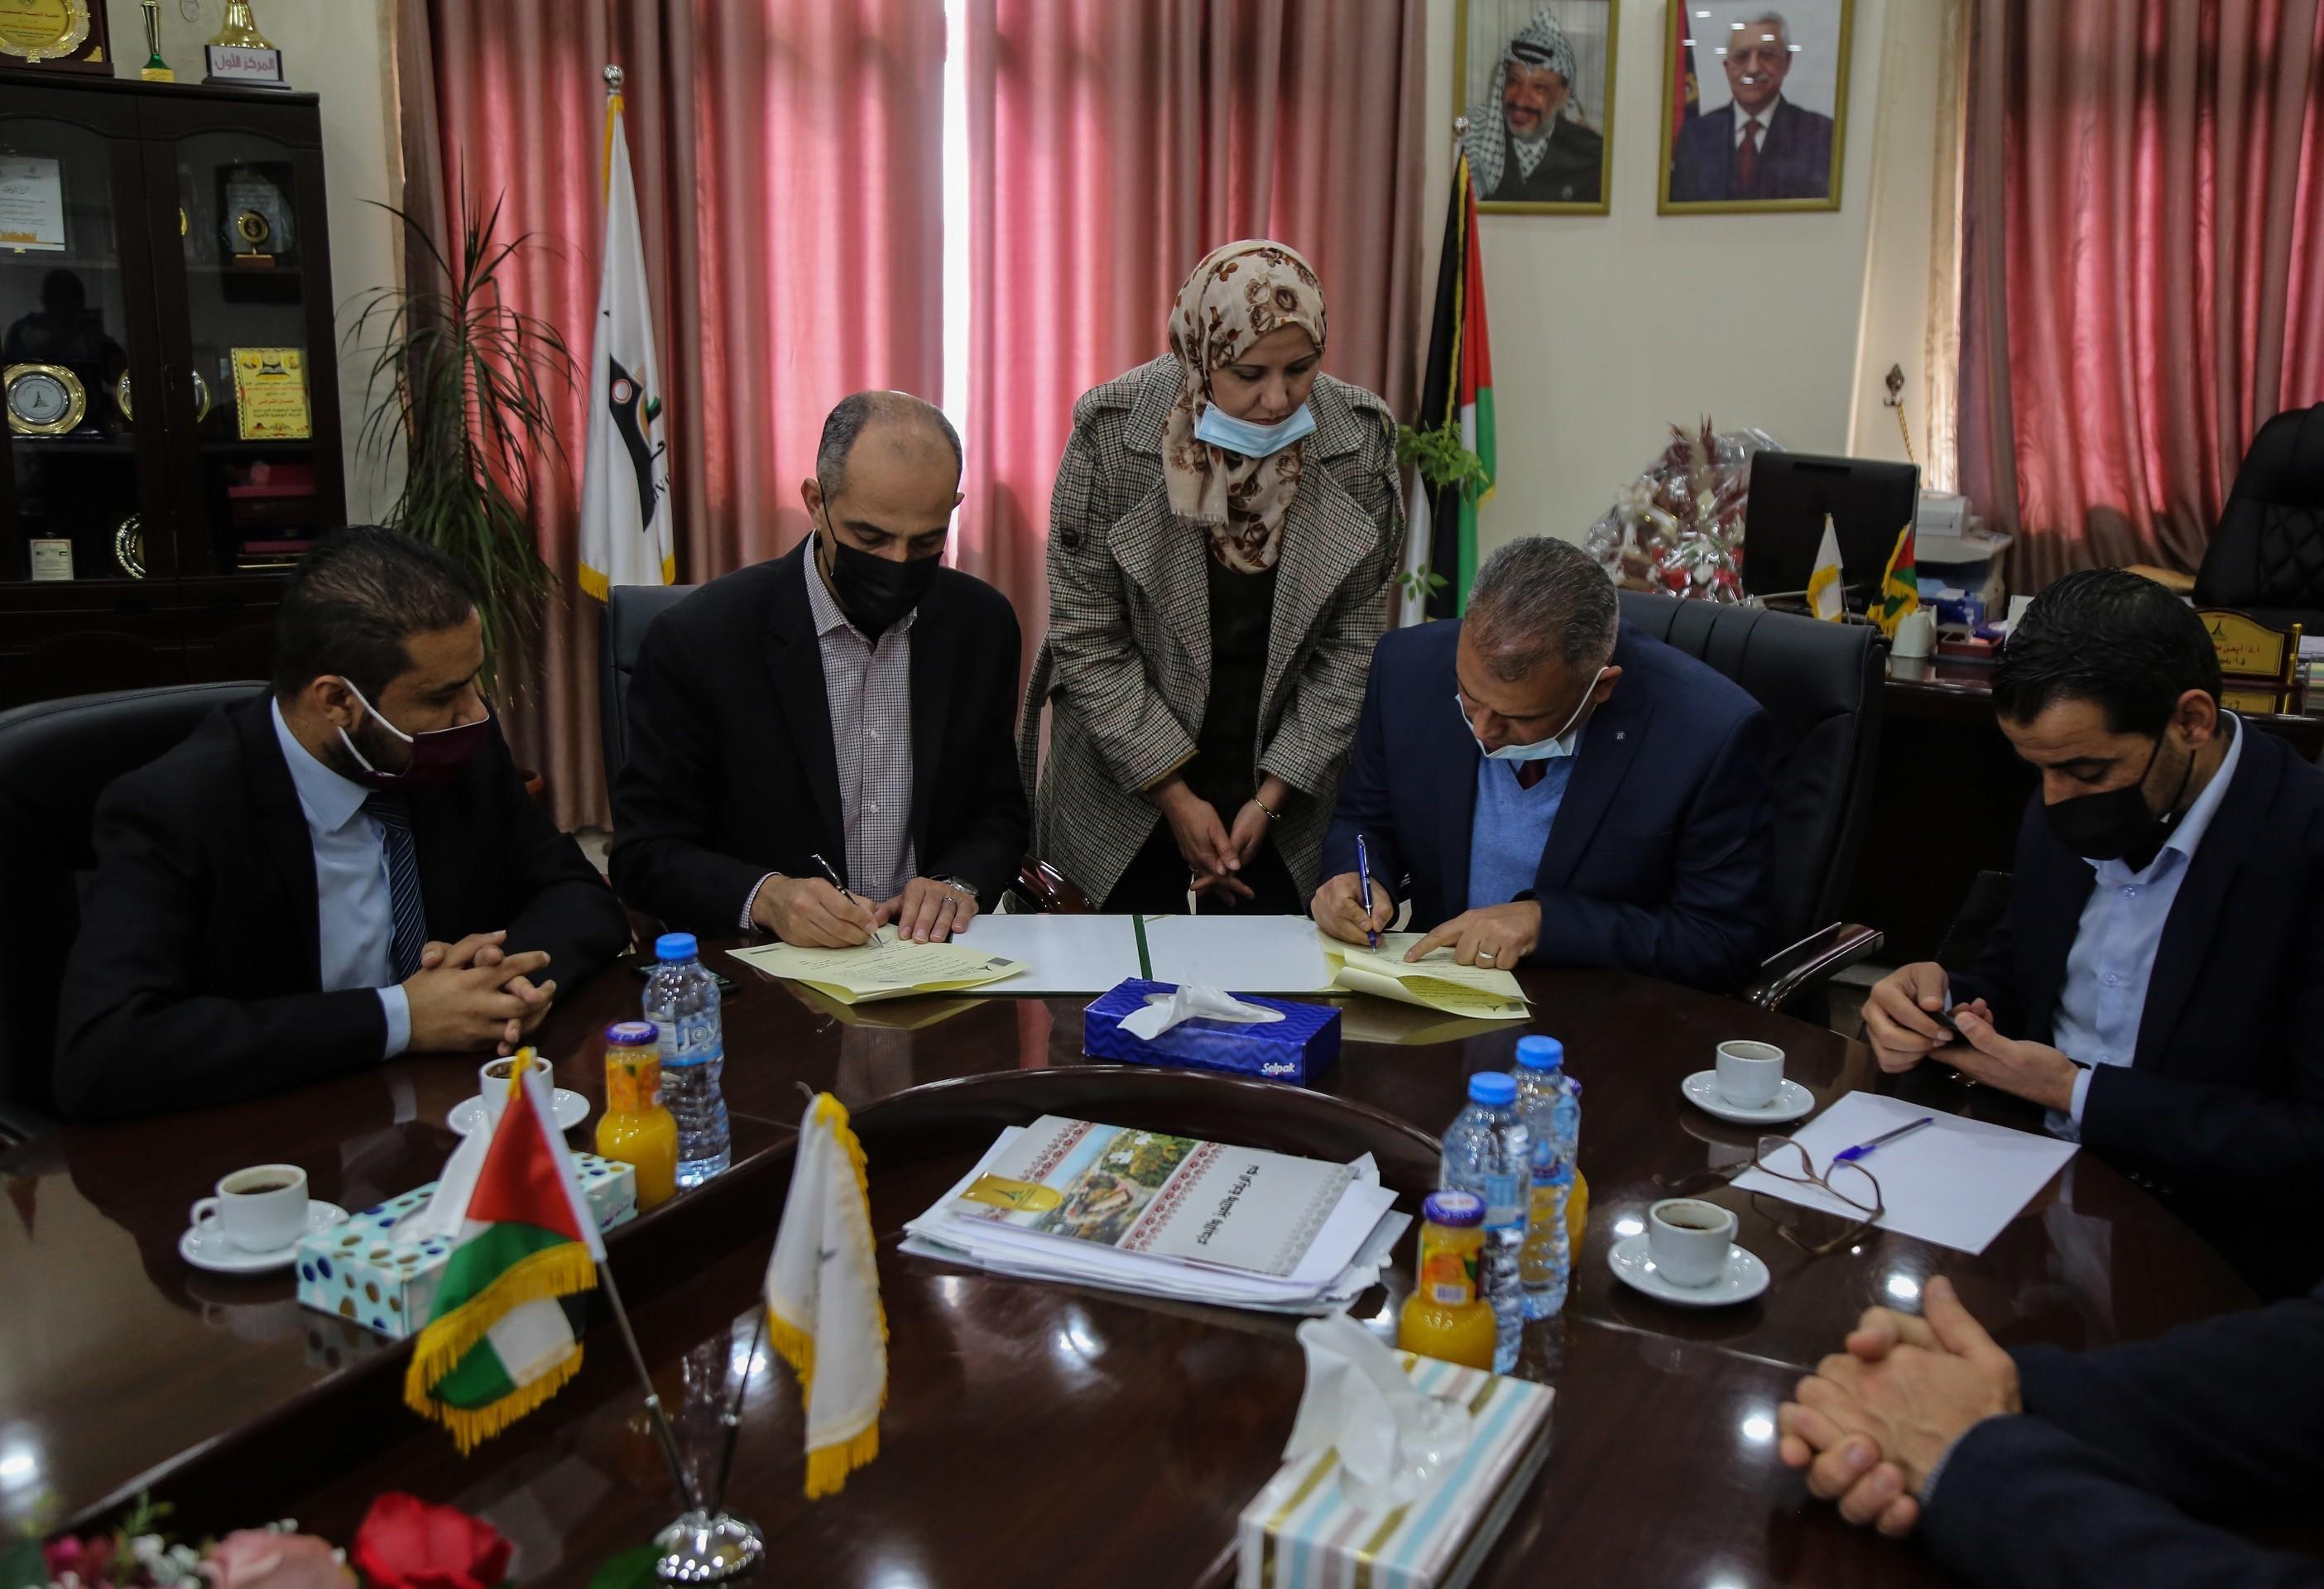 Press House and the Media Faculty at Al-Aqsa University signed a memorandum of understanding